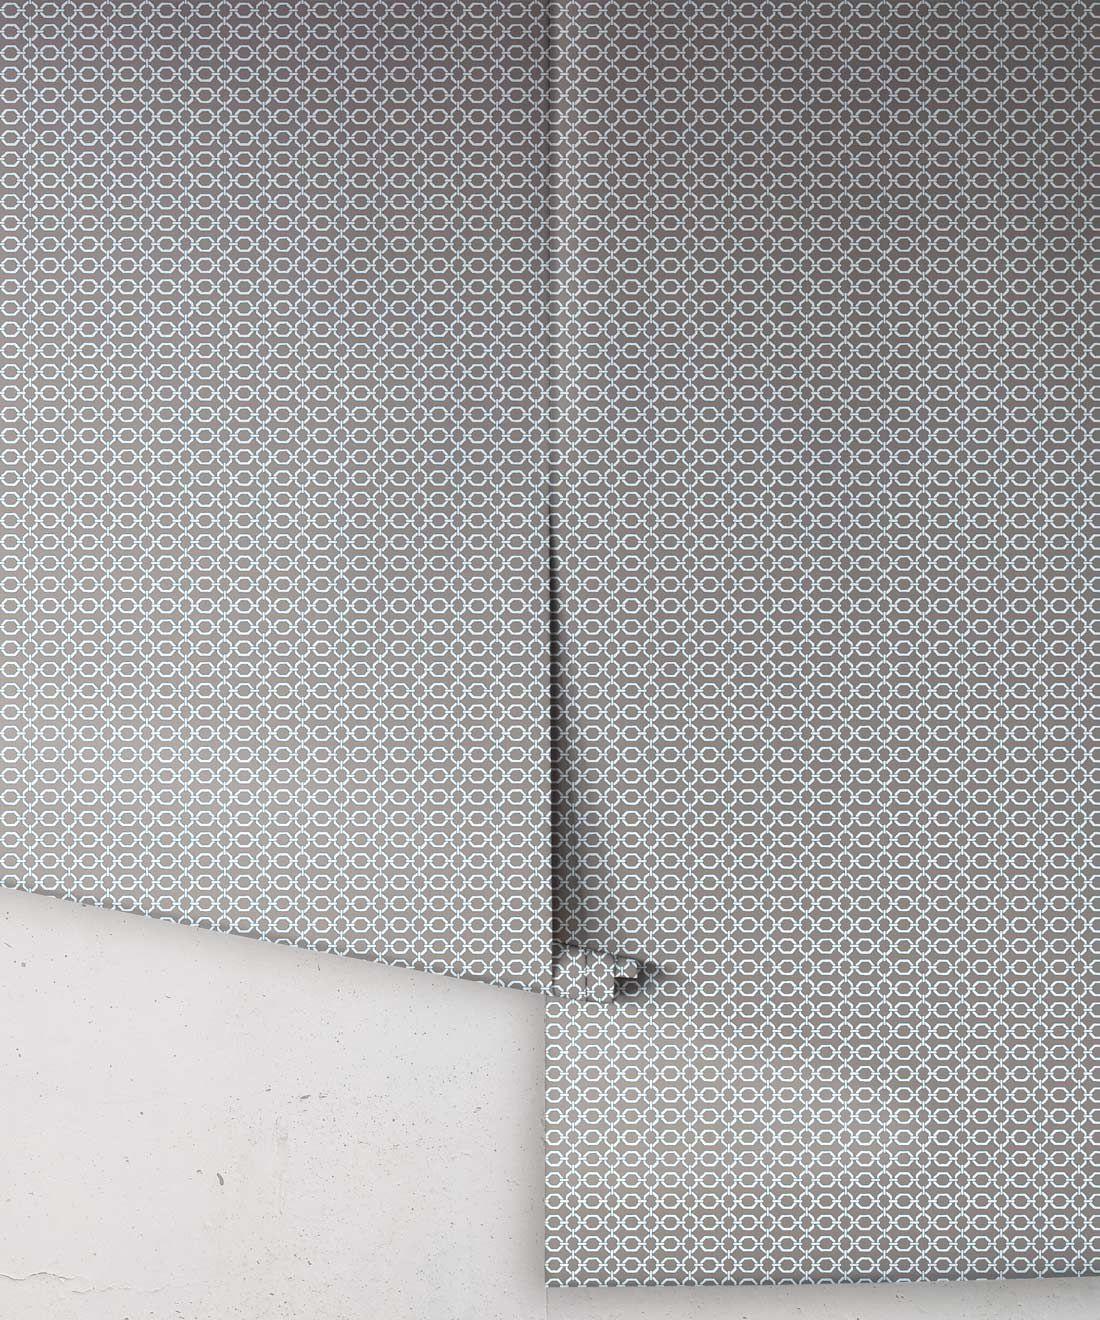 Ravello Wallpaper • Dianne Bergeron • Stone •Rolls